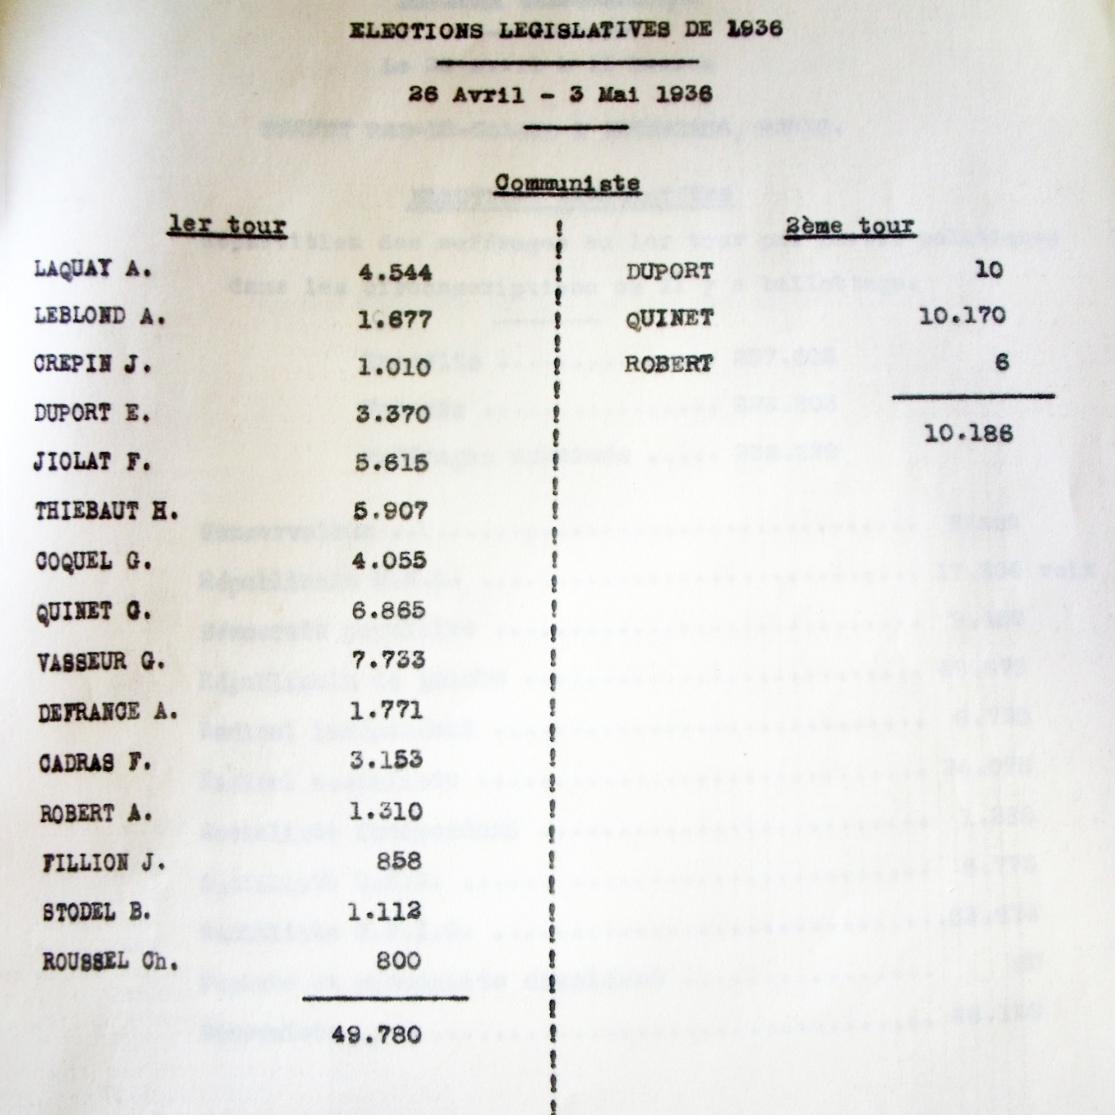 résultats législatives de 36